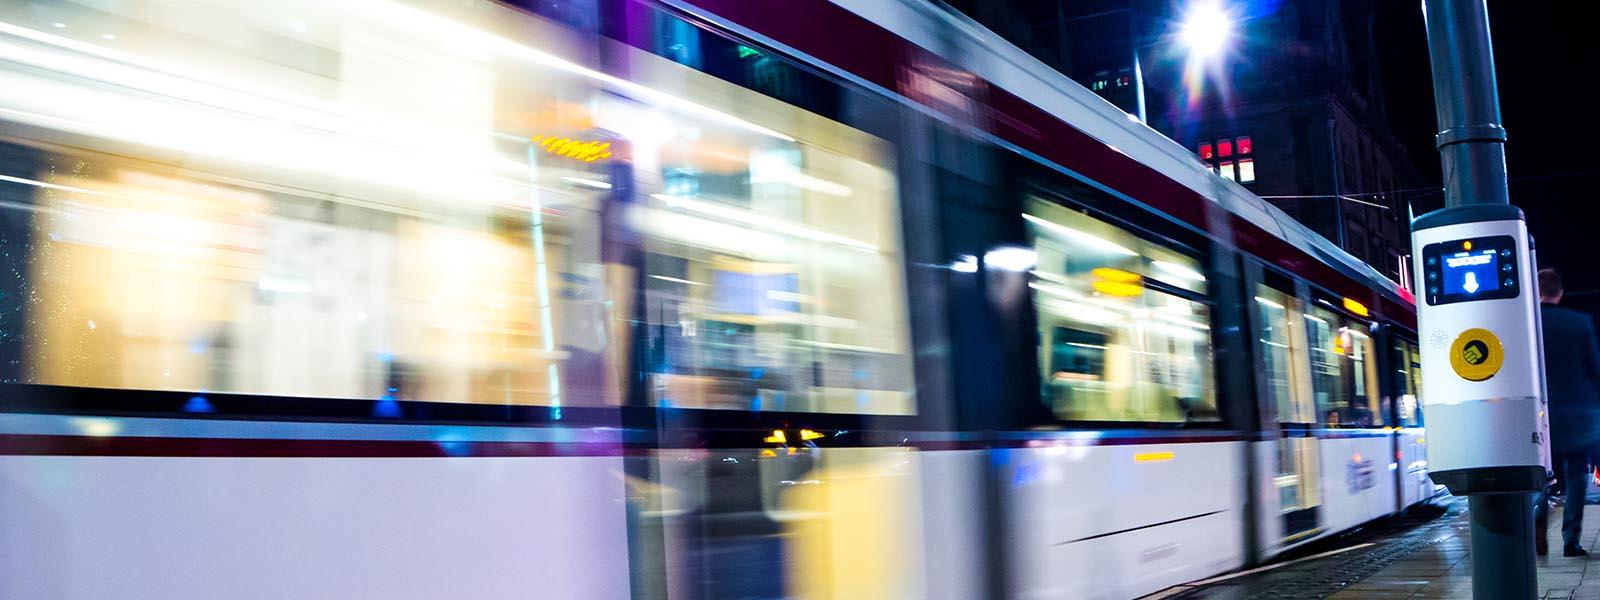 An Edinburgh Tram zooms past the camera